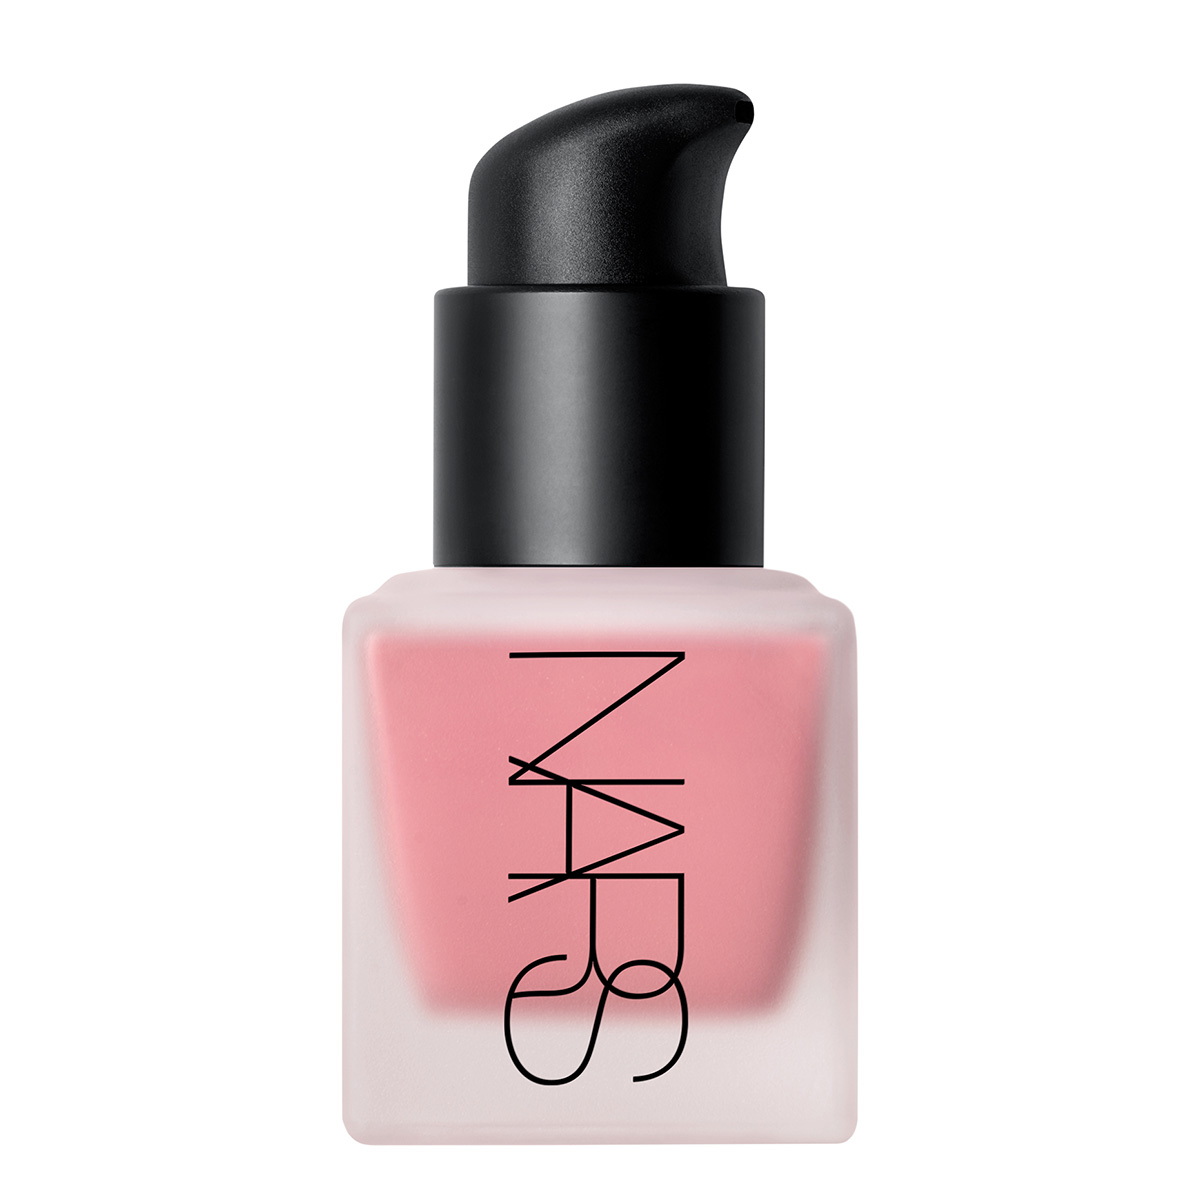 Liquid Blush Orgasm Nars Cosmetics